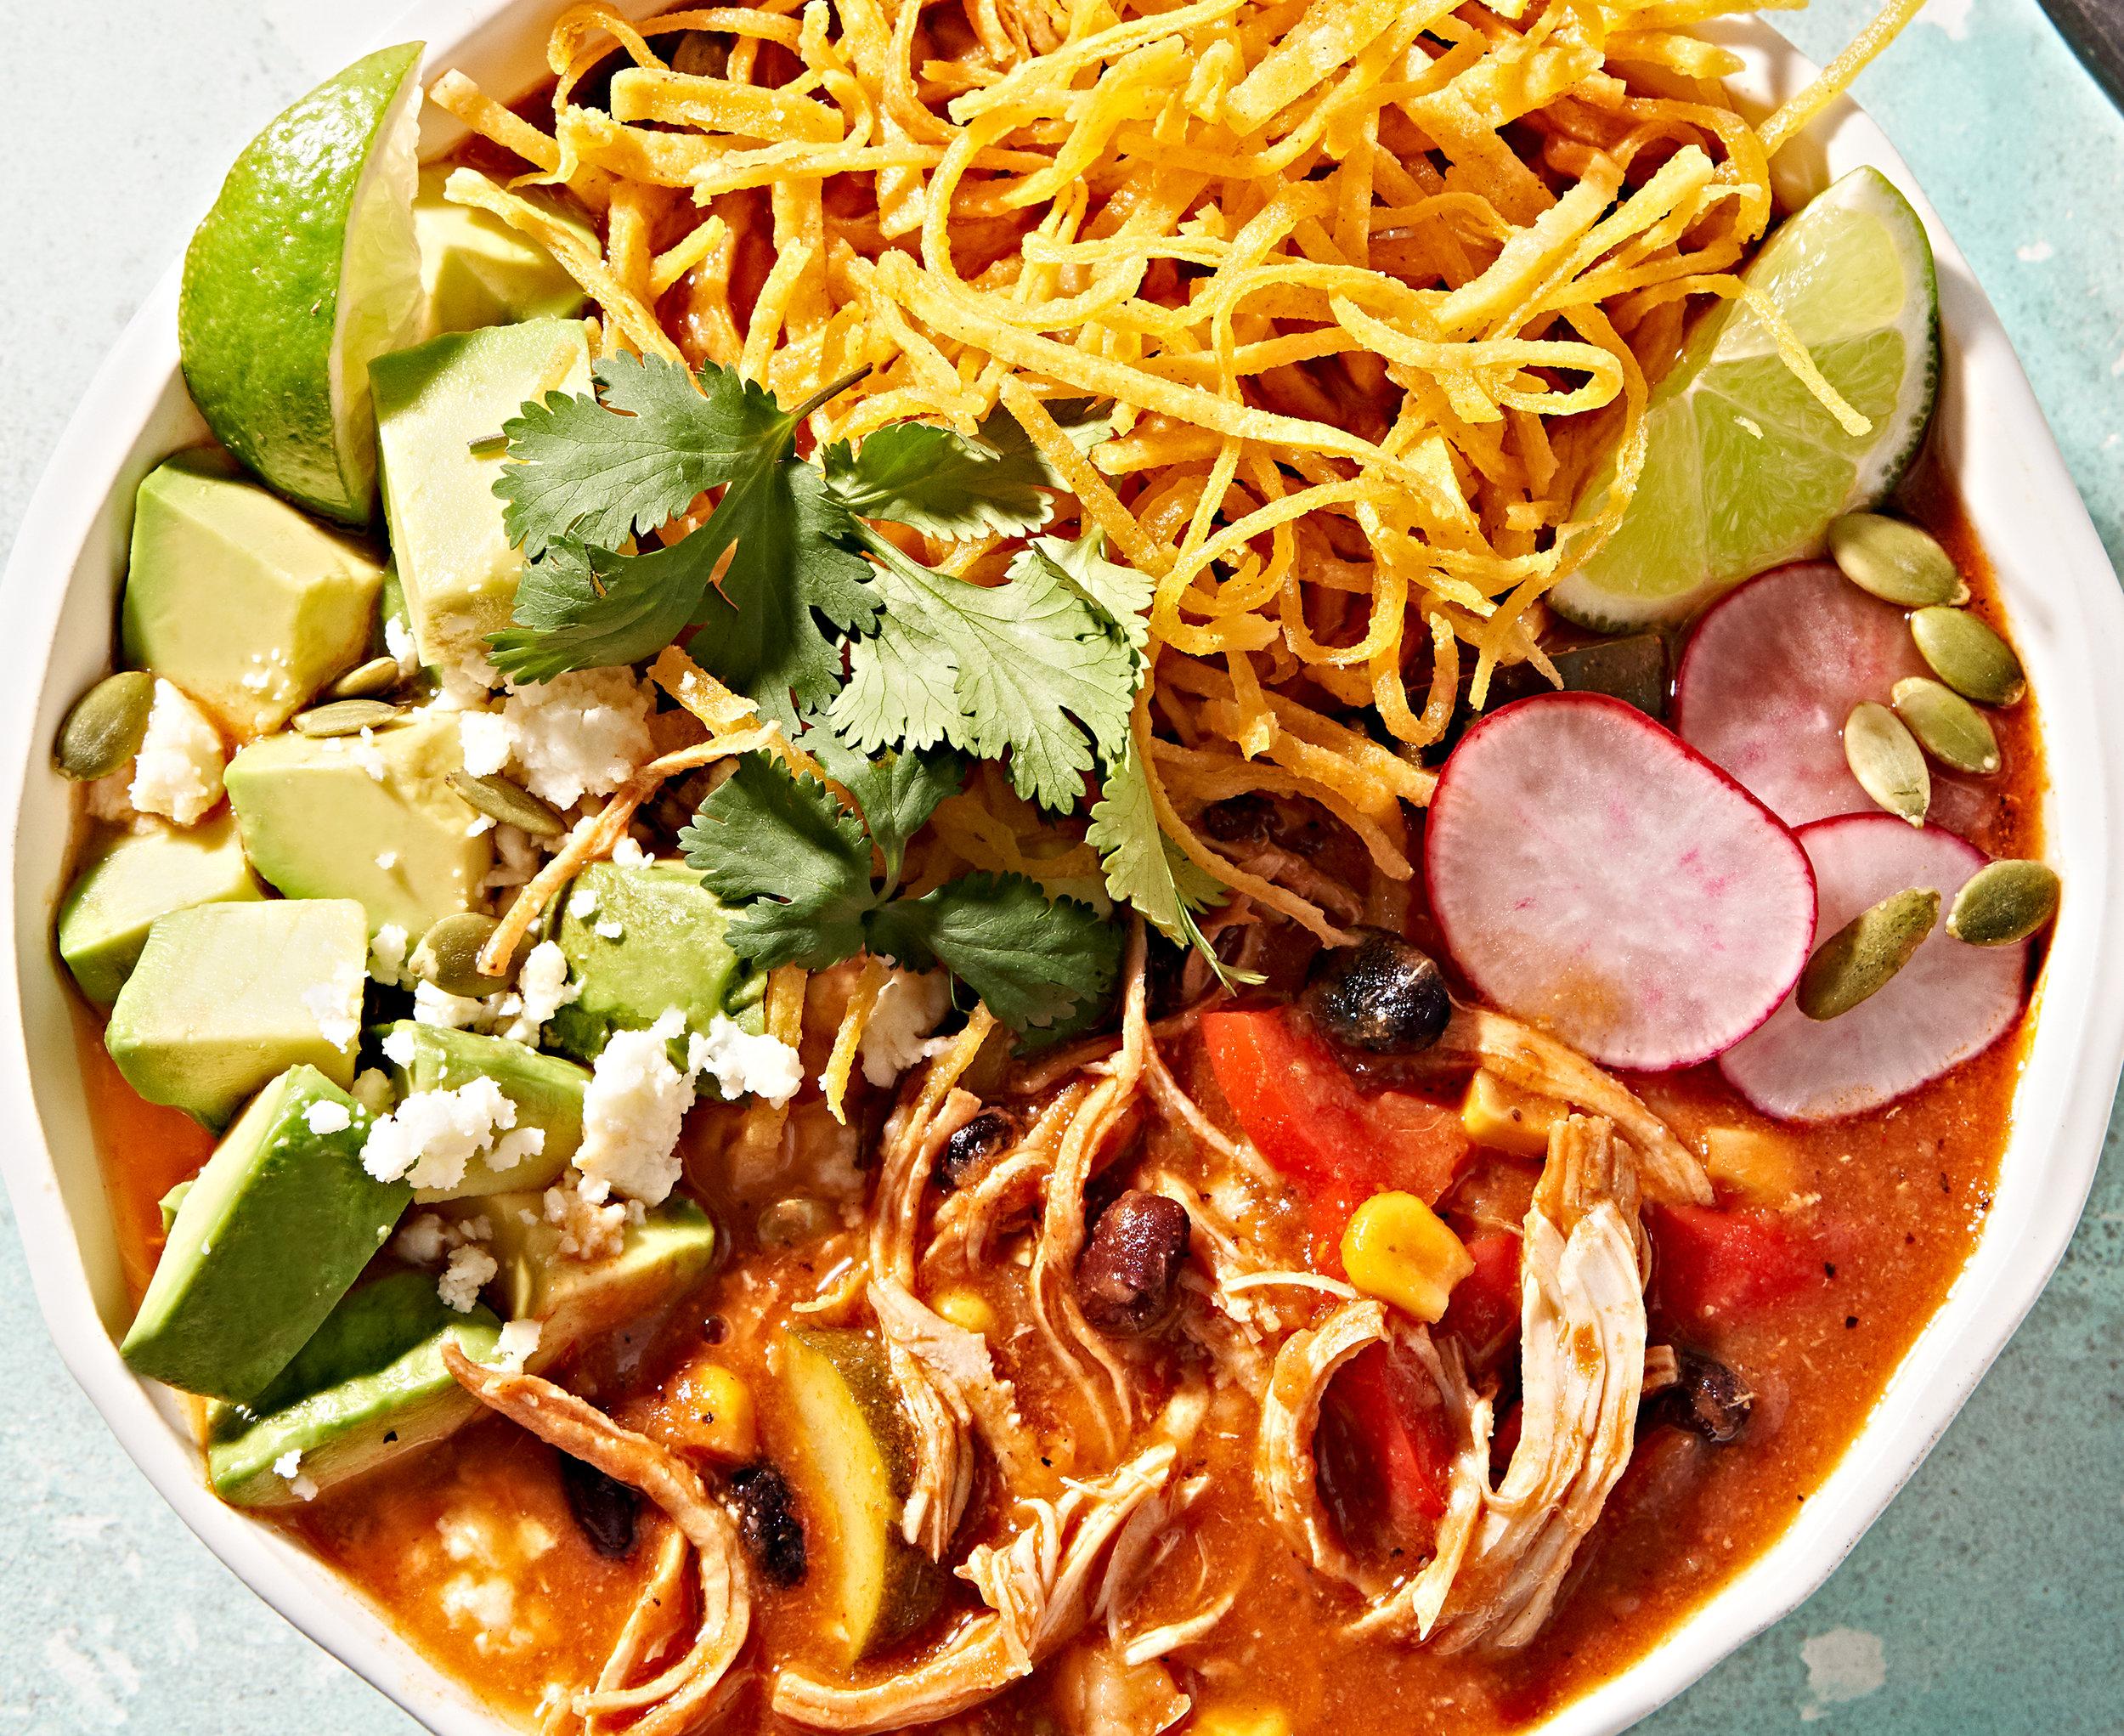 Instant Pot Mexican chicken tortilla soup with avocado